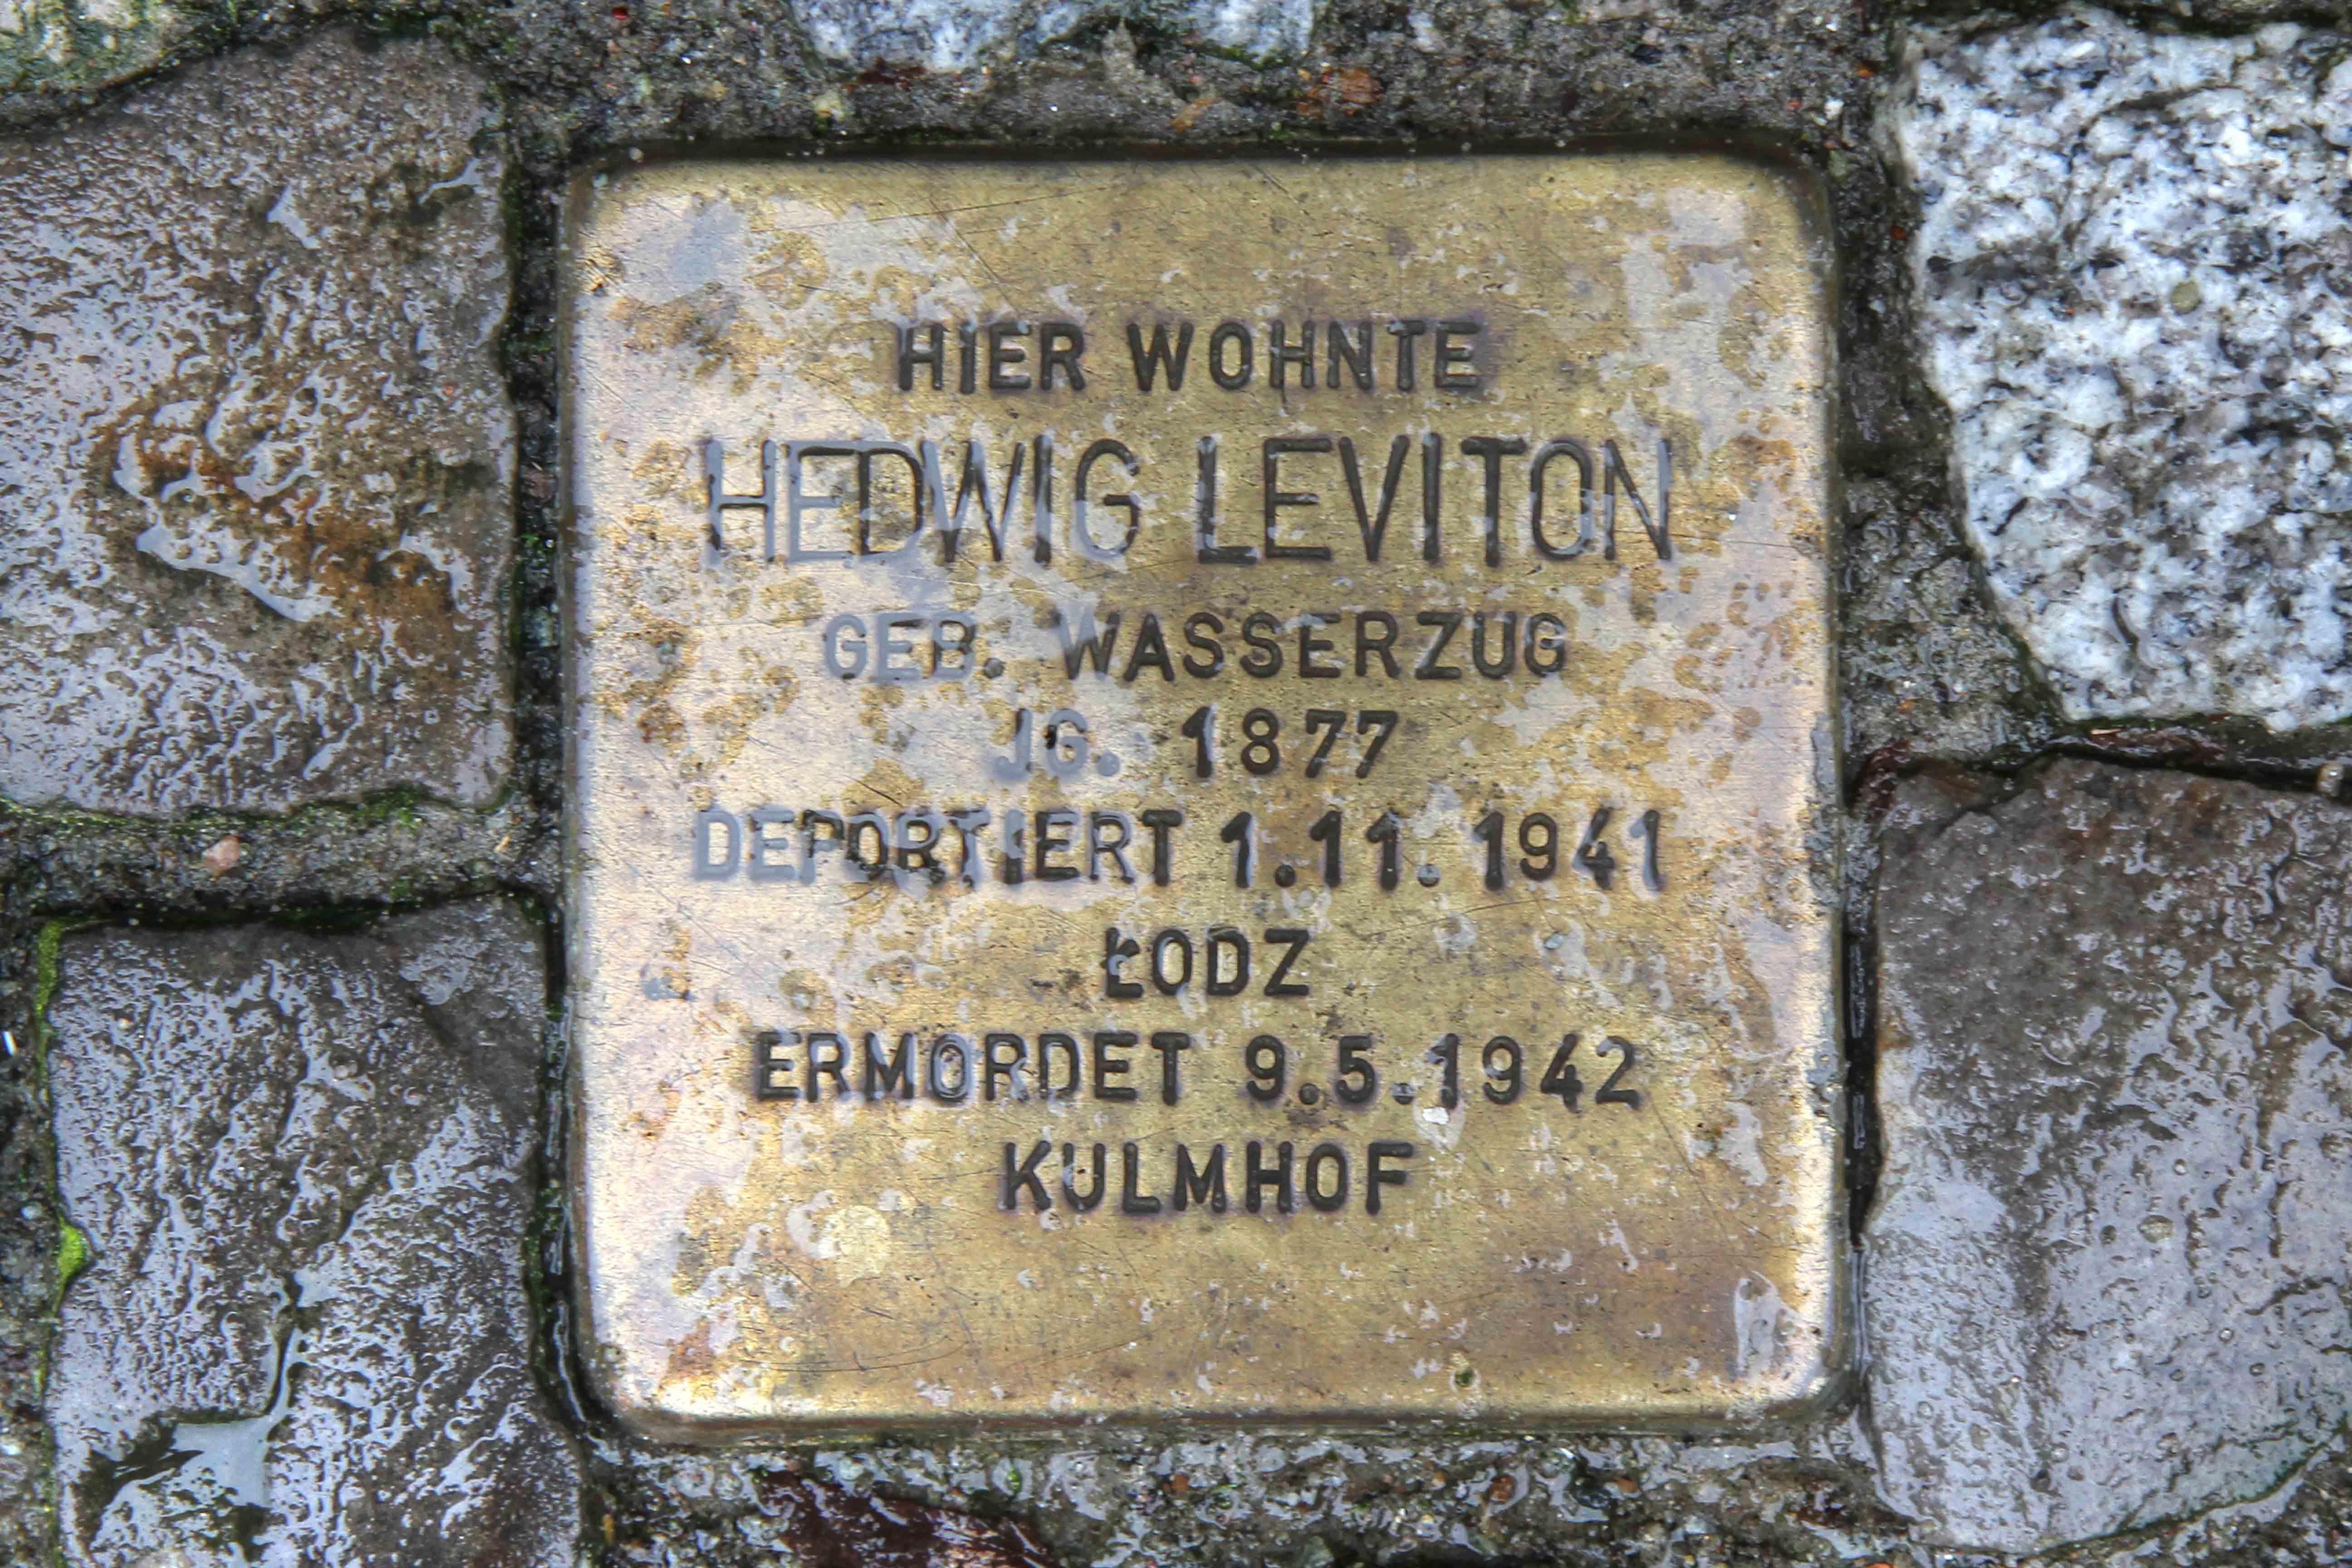 Stolpersteine Berlin 160: In memory of Hedwig Leviton (Niebuhrstrasse 65)